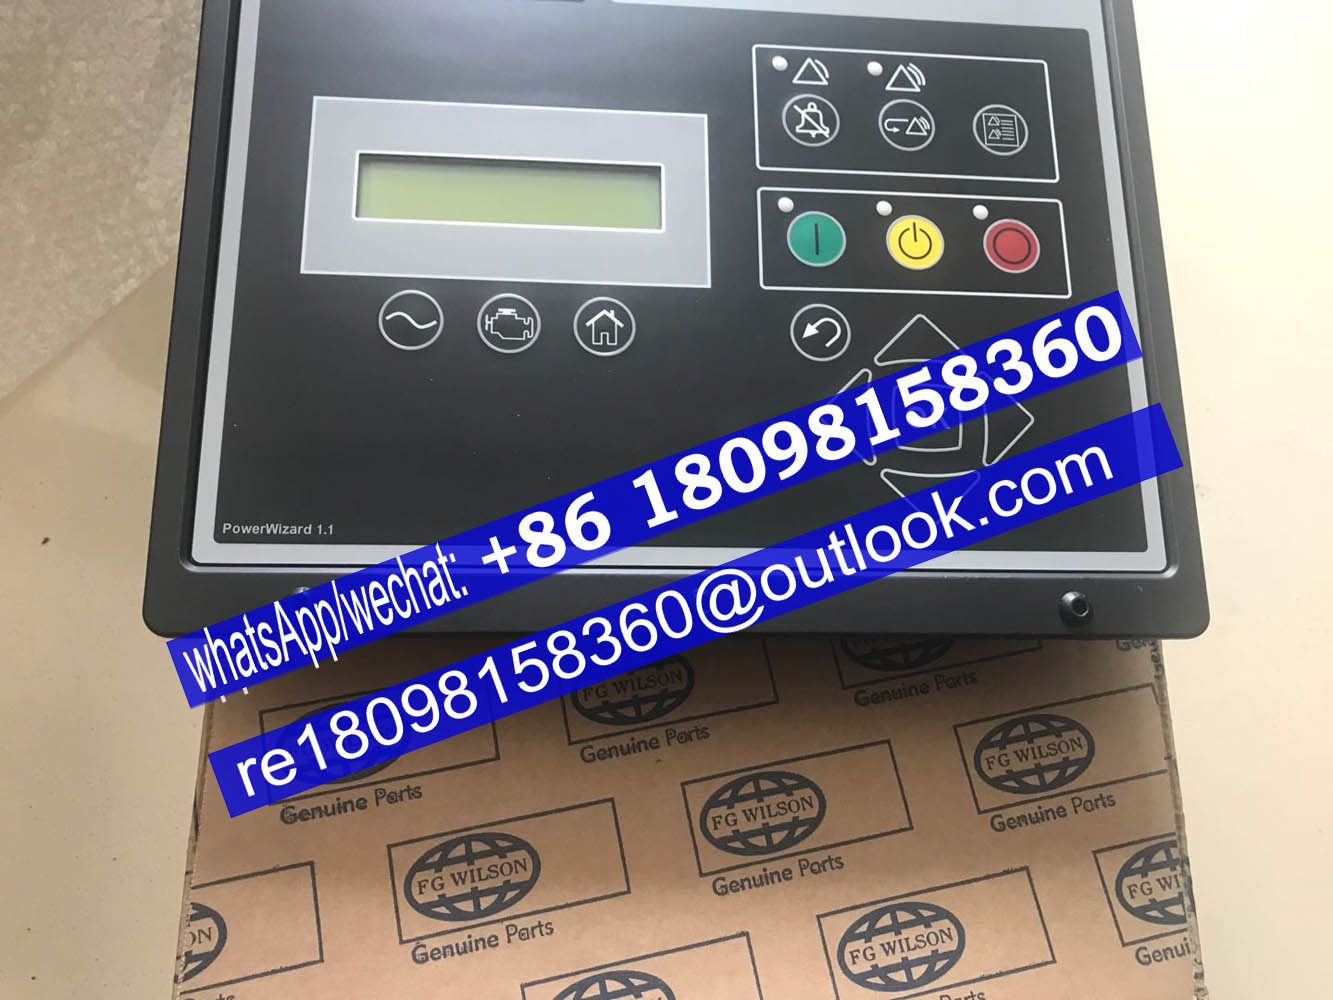 PowerWizard 1.0 / 2.0 Digital Control Panels /Providing safe control of generator set/ FG Wilson